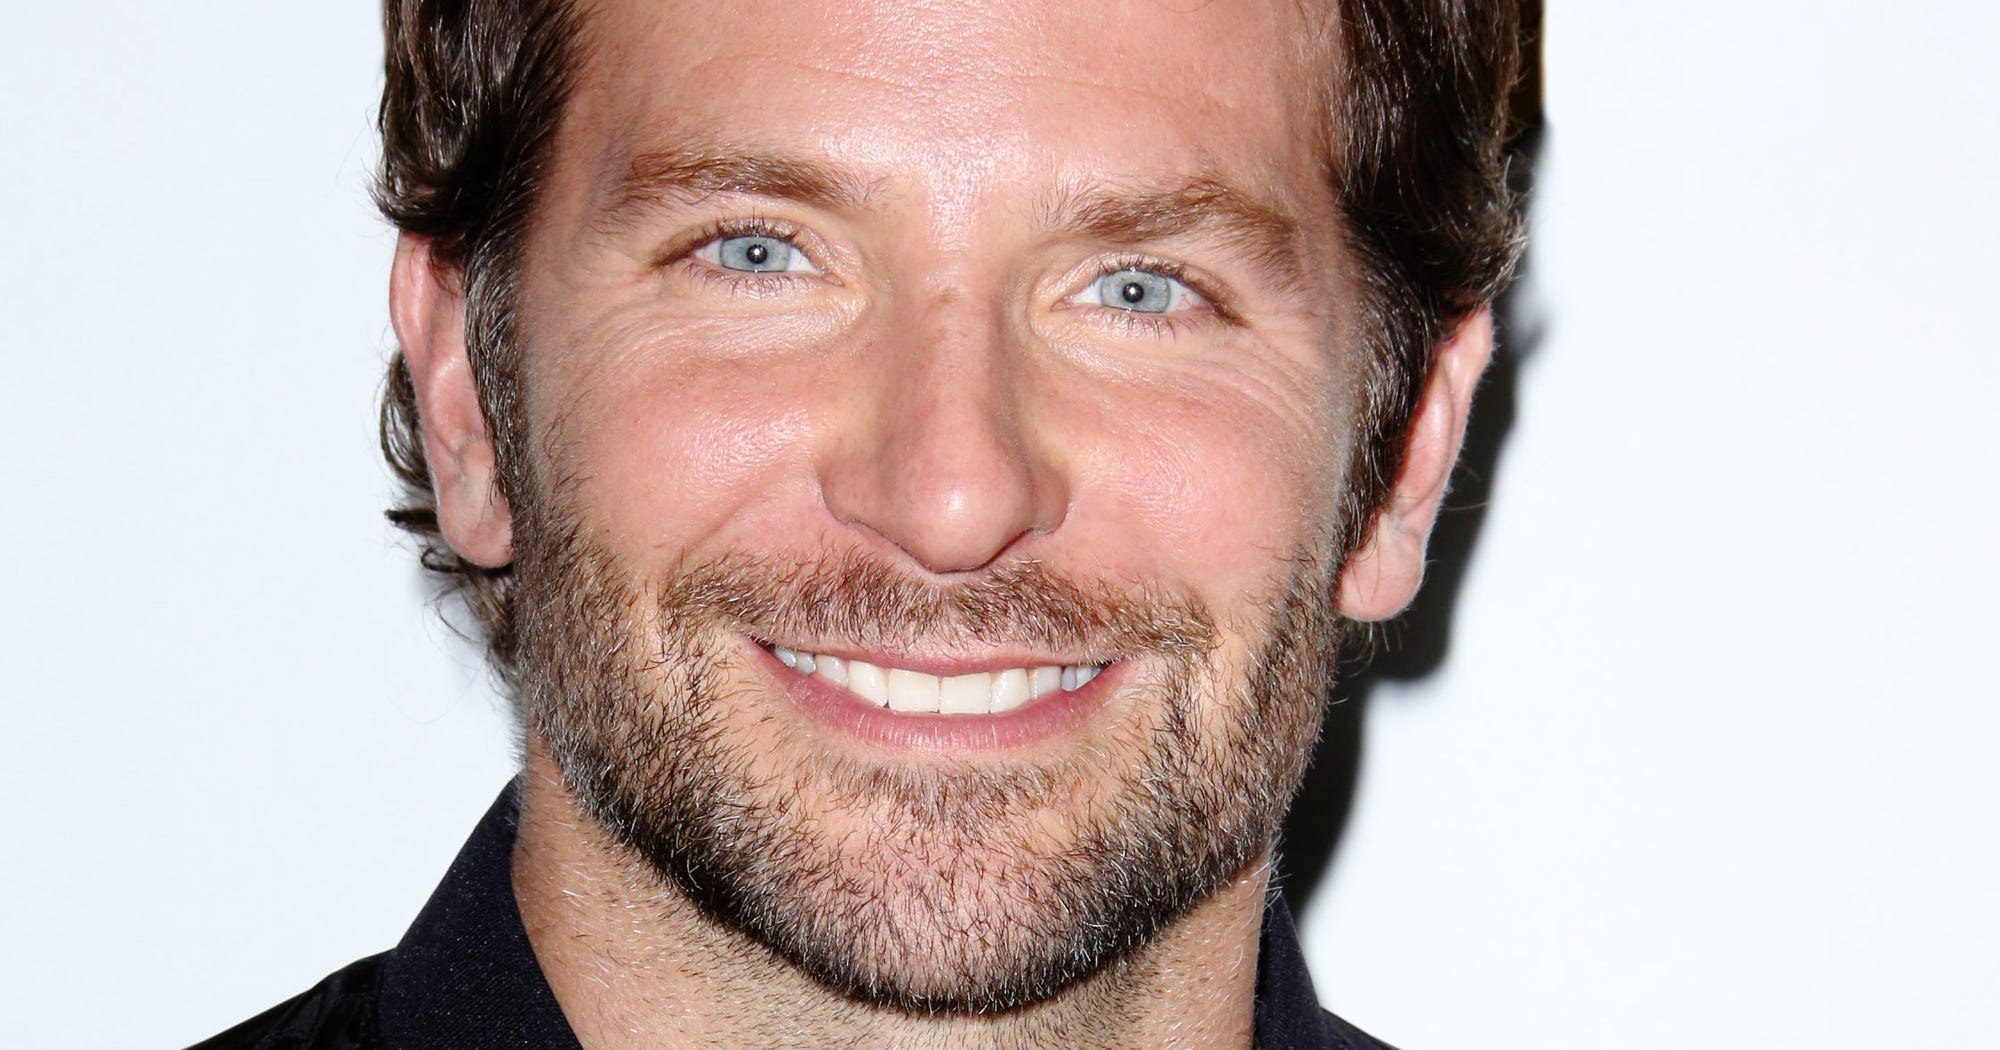 Bradley Cooper Stunt Double A Star Is Born Lookalike